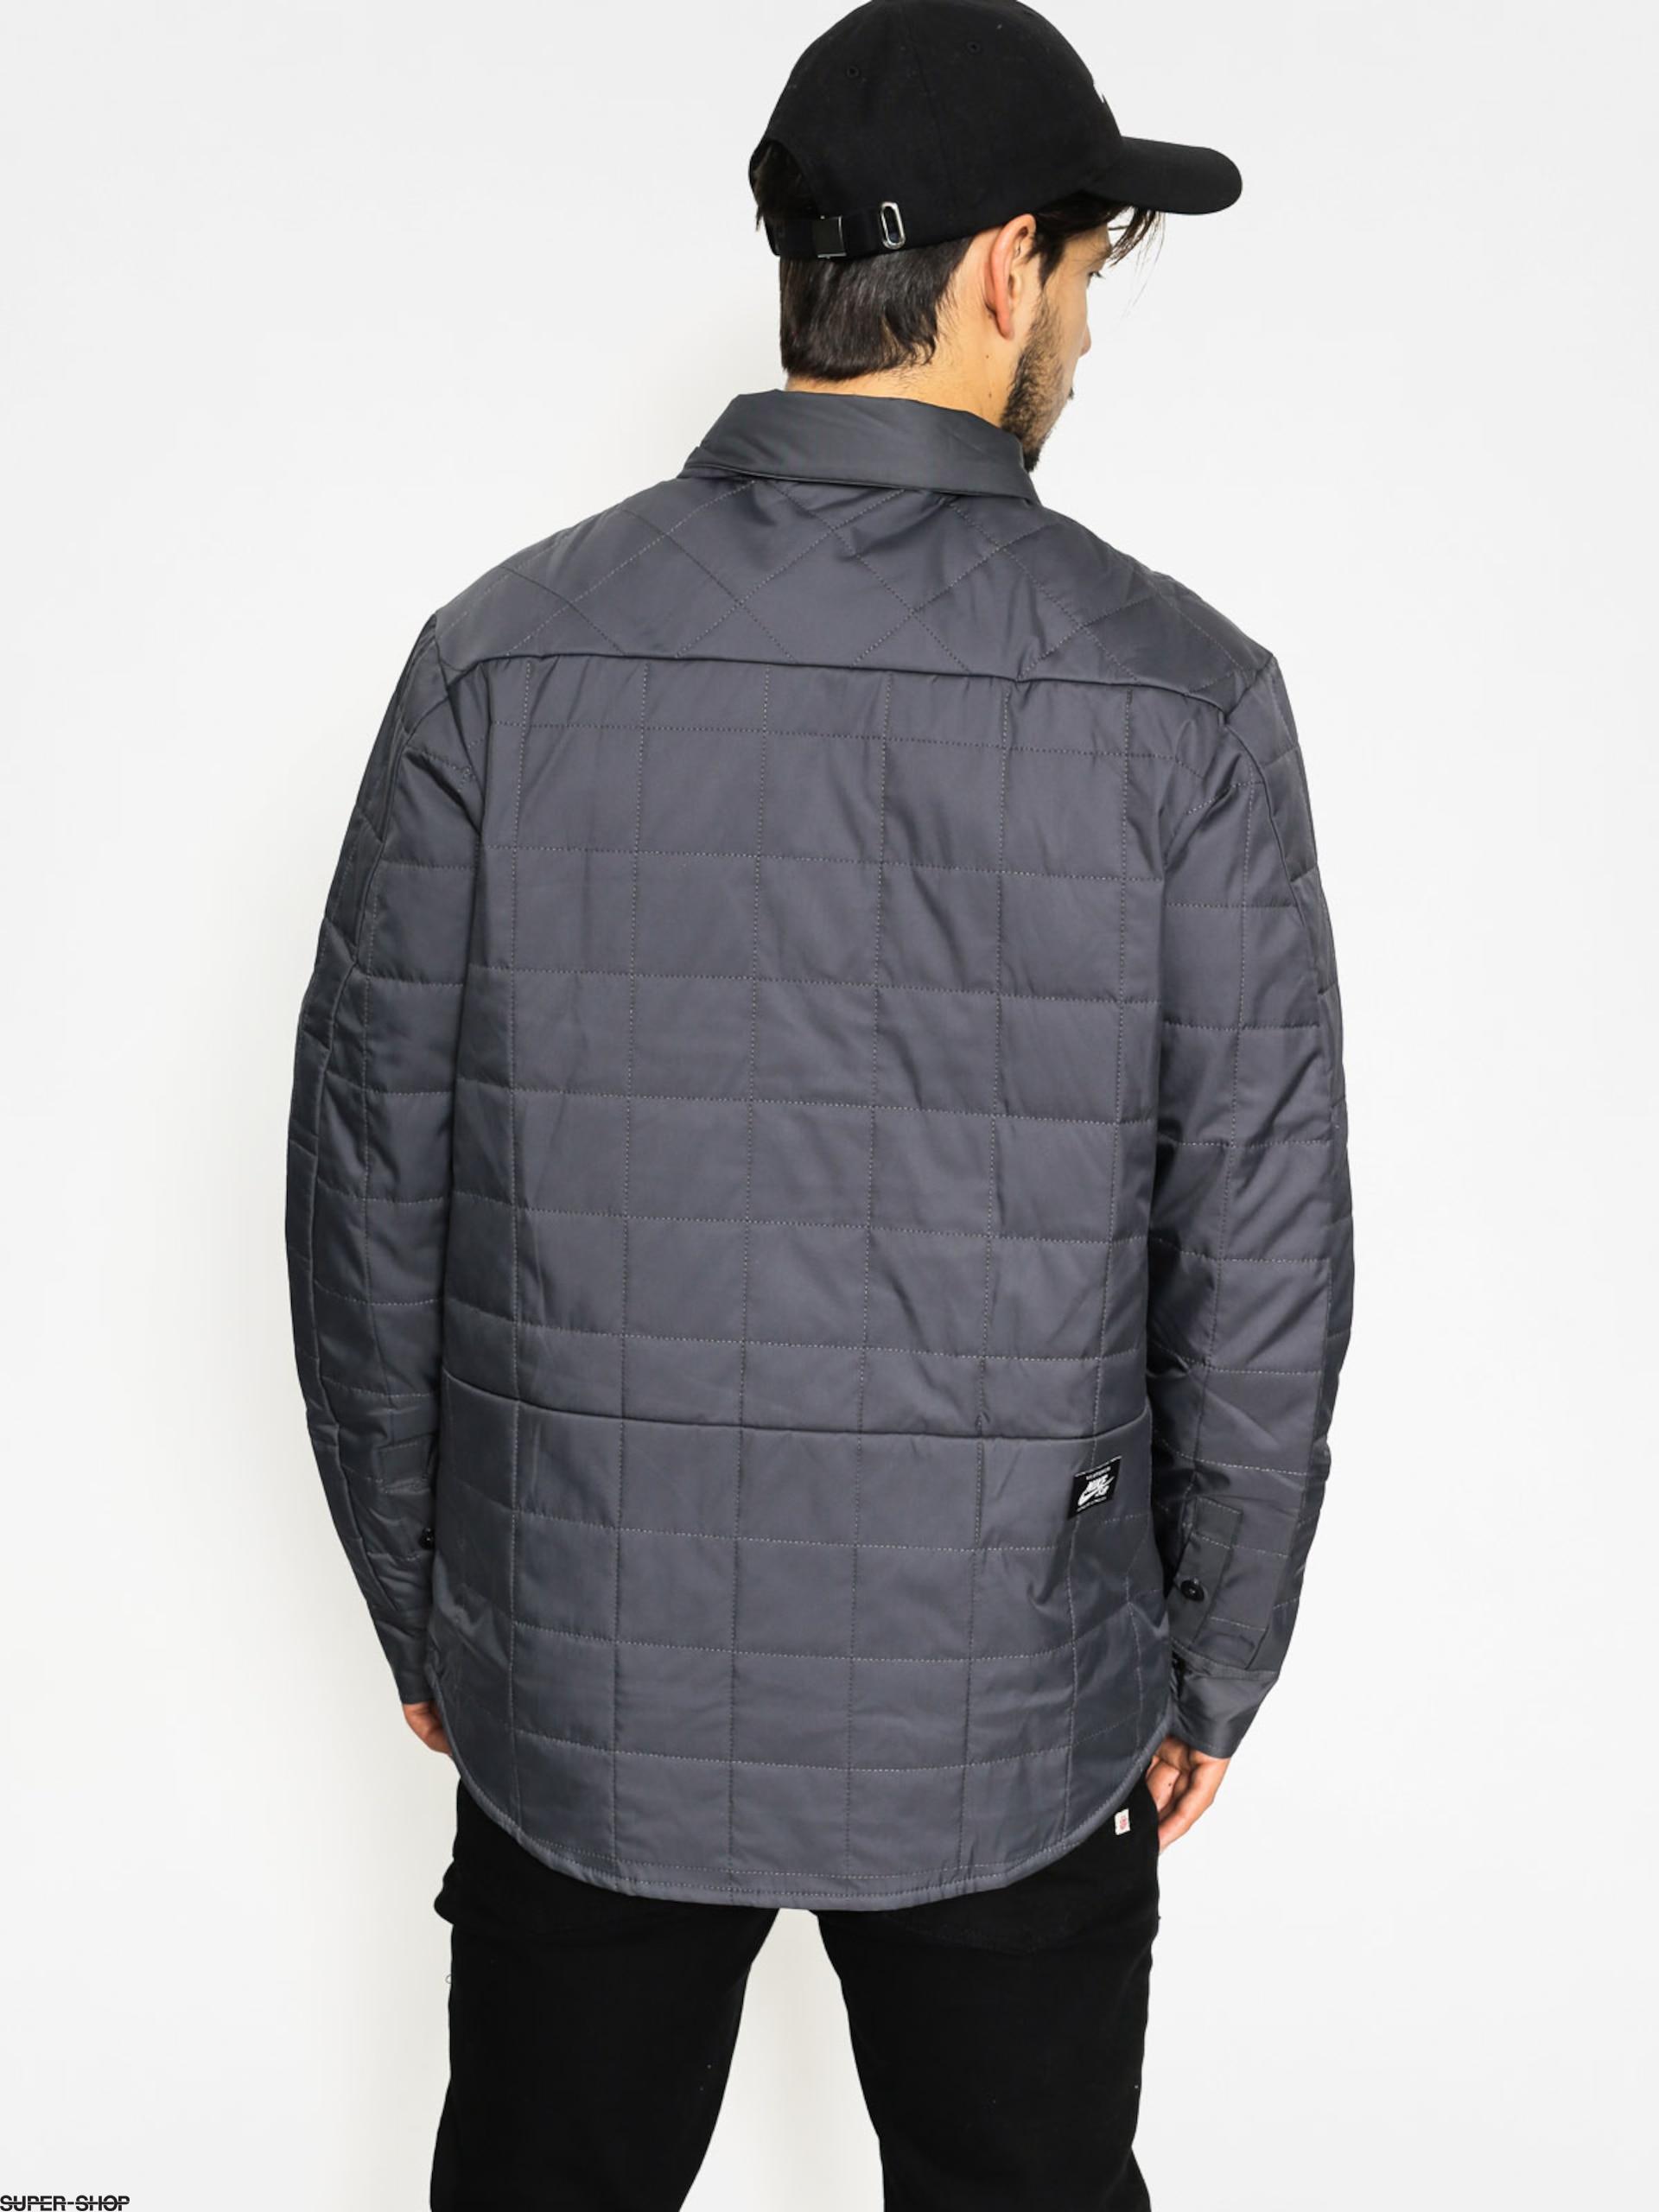 a8548b6d14a1 Nike SB Jacket Holgate Winterized (grey)